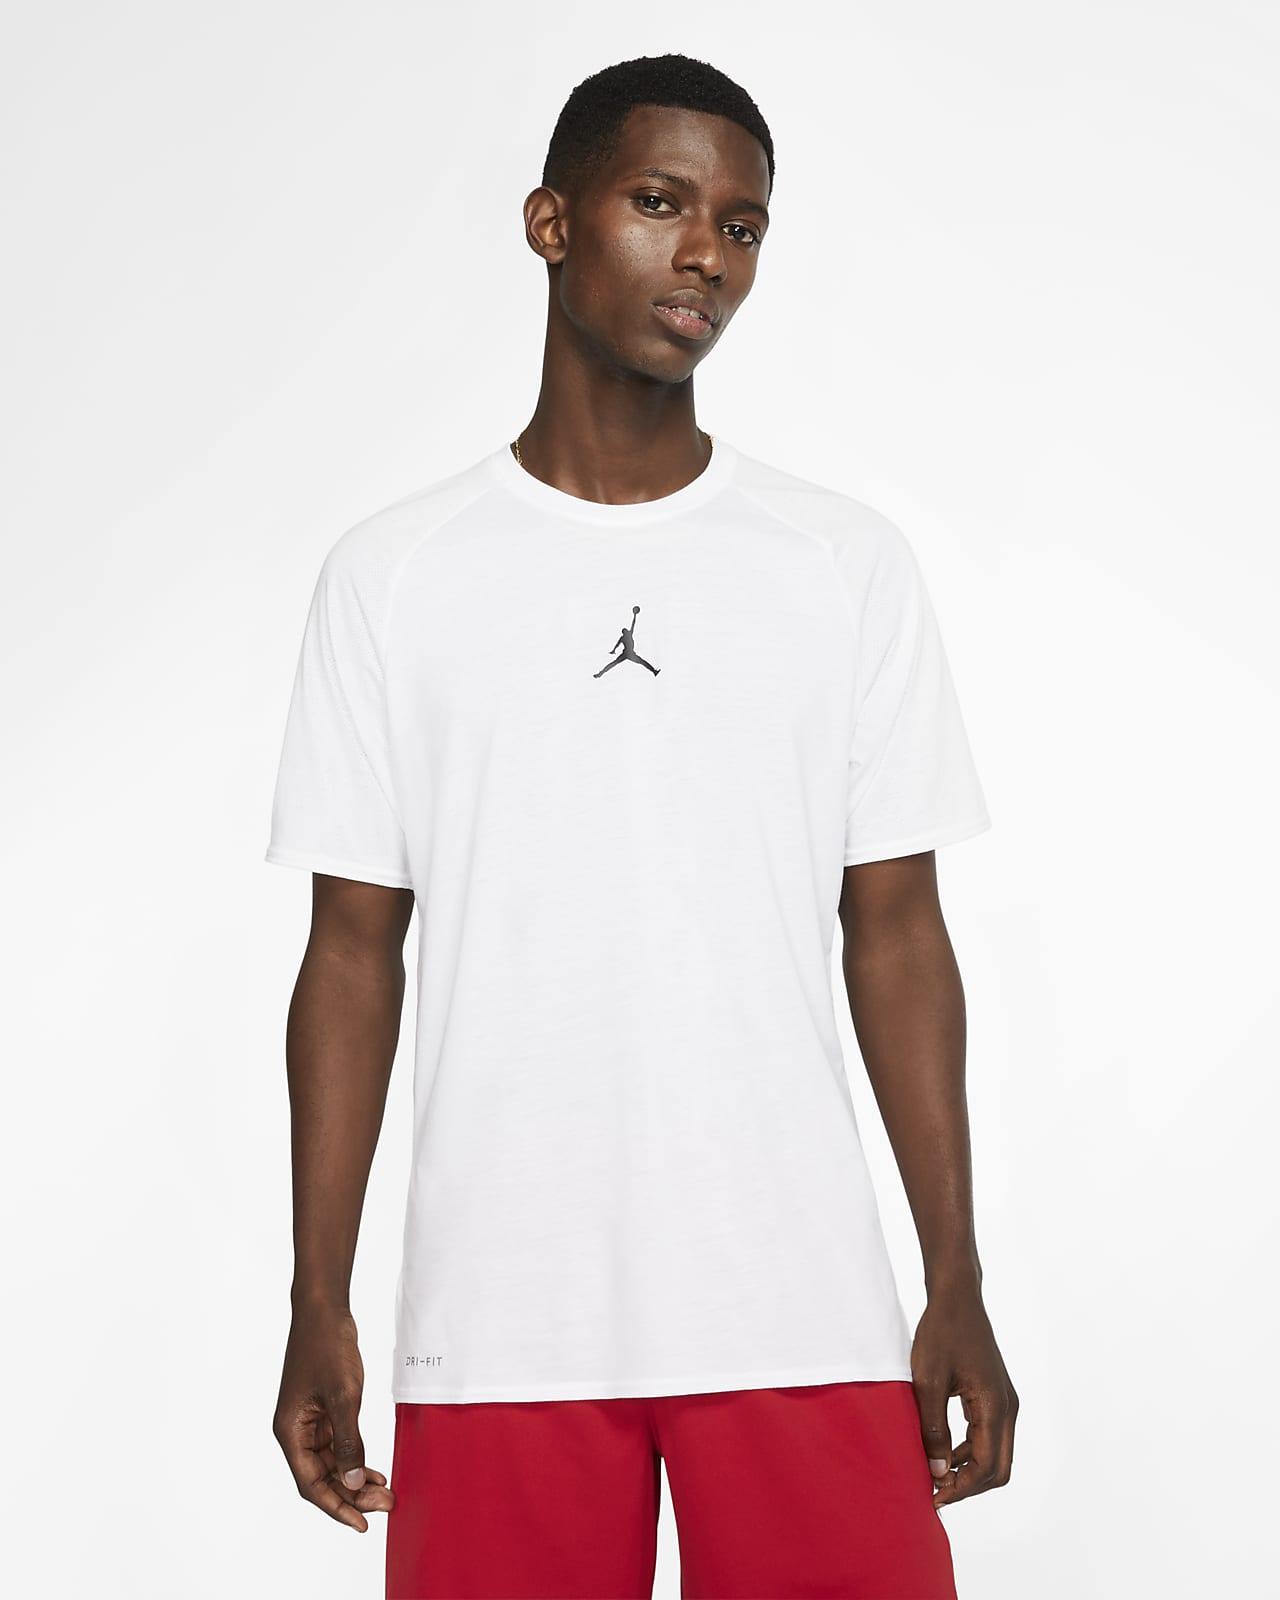 Jordan 23 Alpha Men's Short-Sleeve Training Top